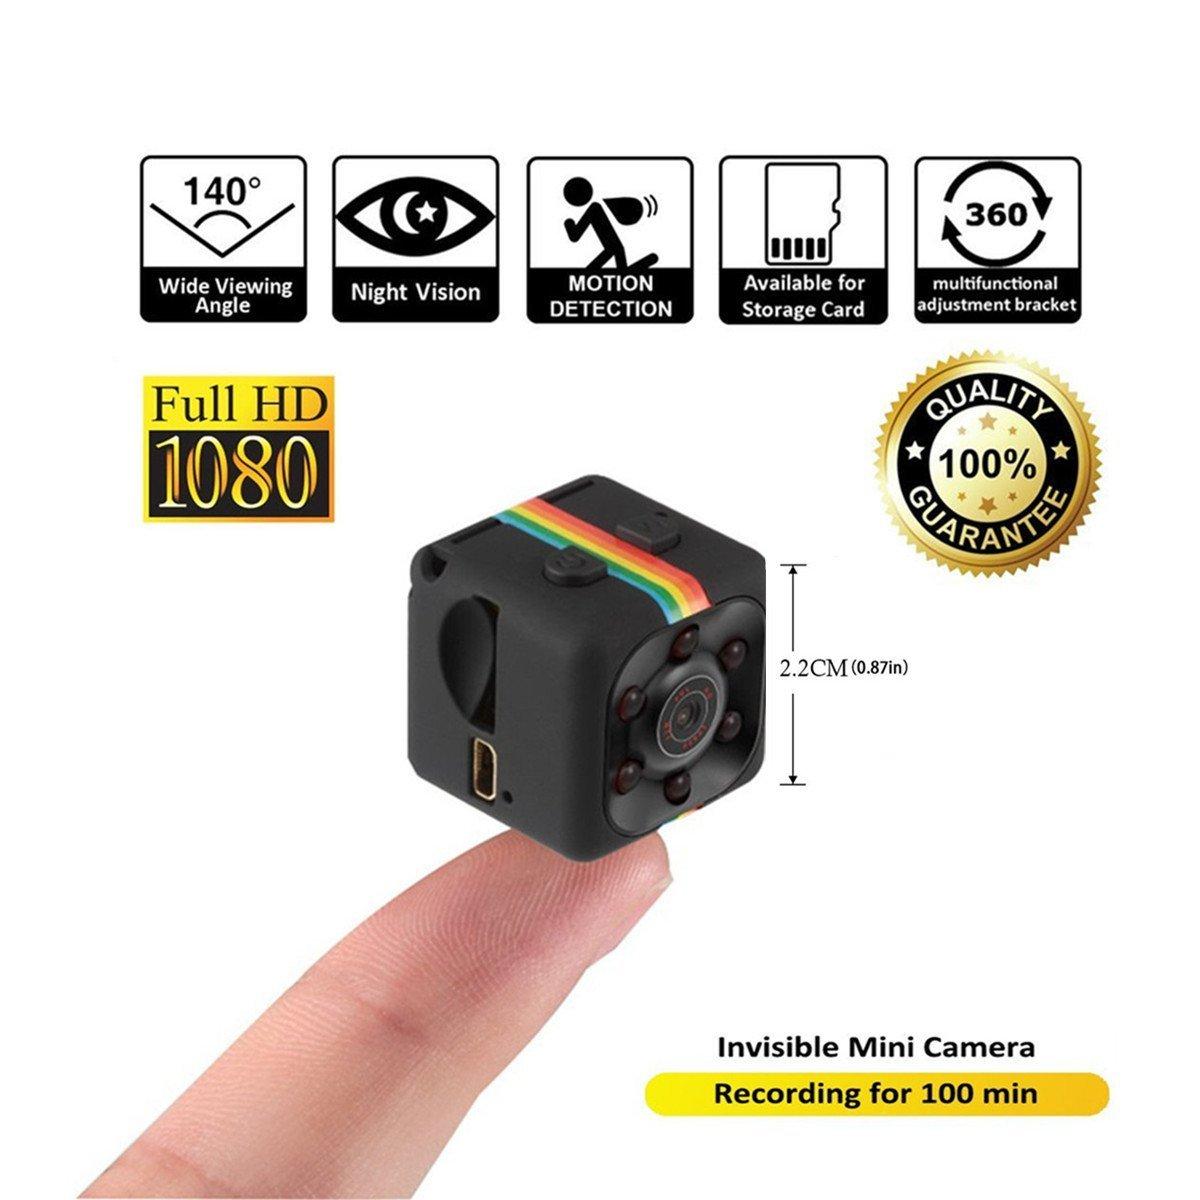 SQ11 cámara Mini 1080 p deporte Mini DV de la visión nocturna infrarroja de Monitor oculta pequeña cámara SQ 11 pequeños cámara DV grabadora de vídeo